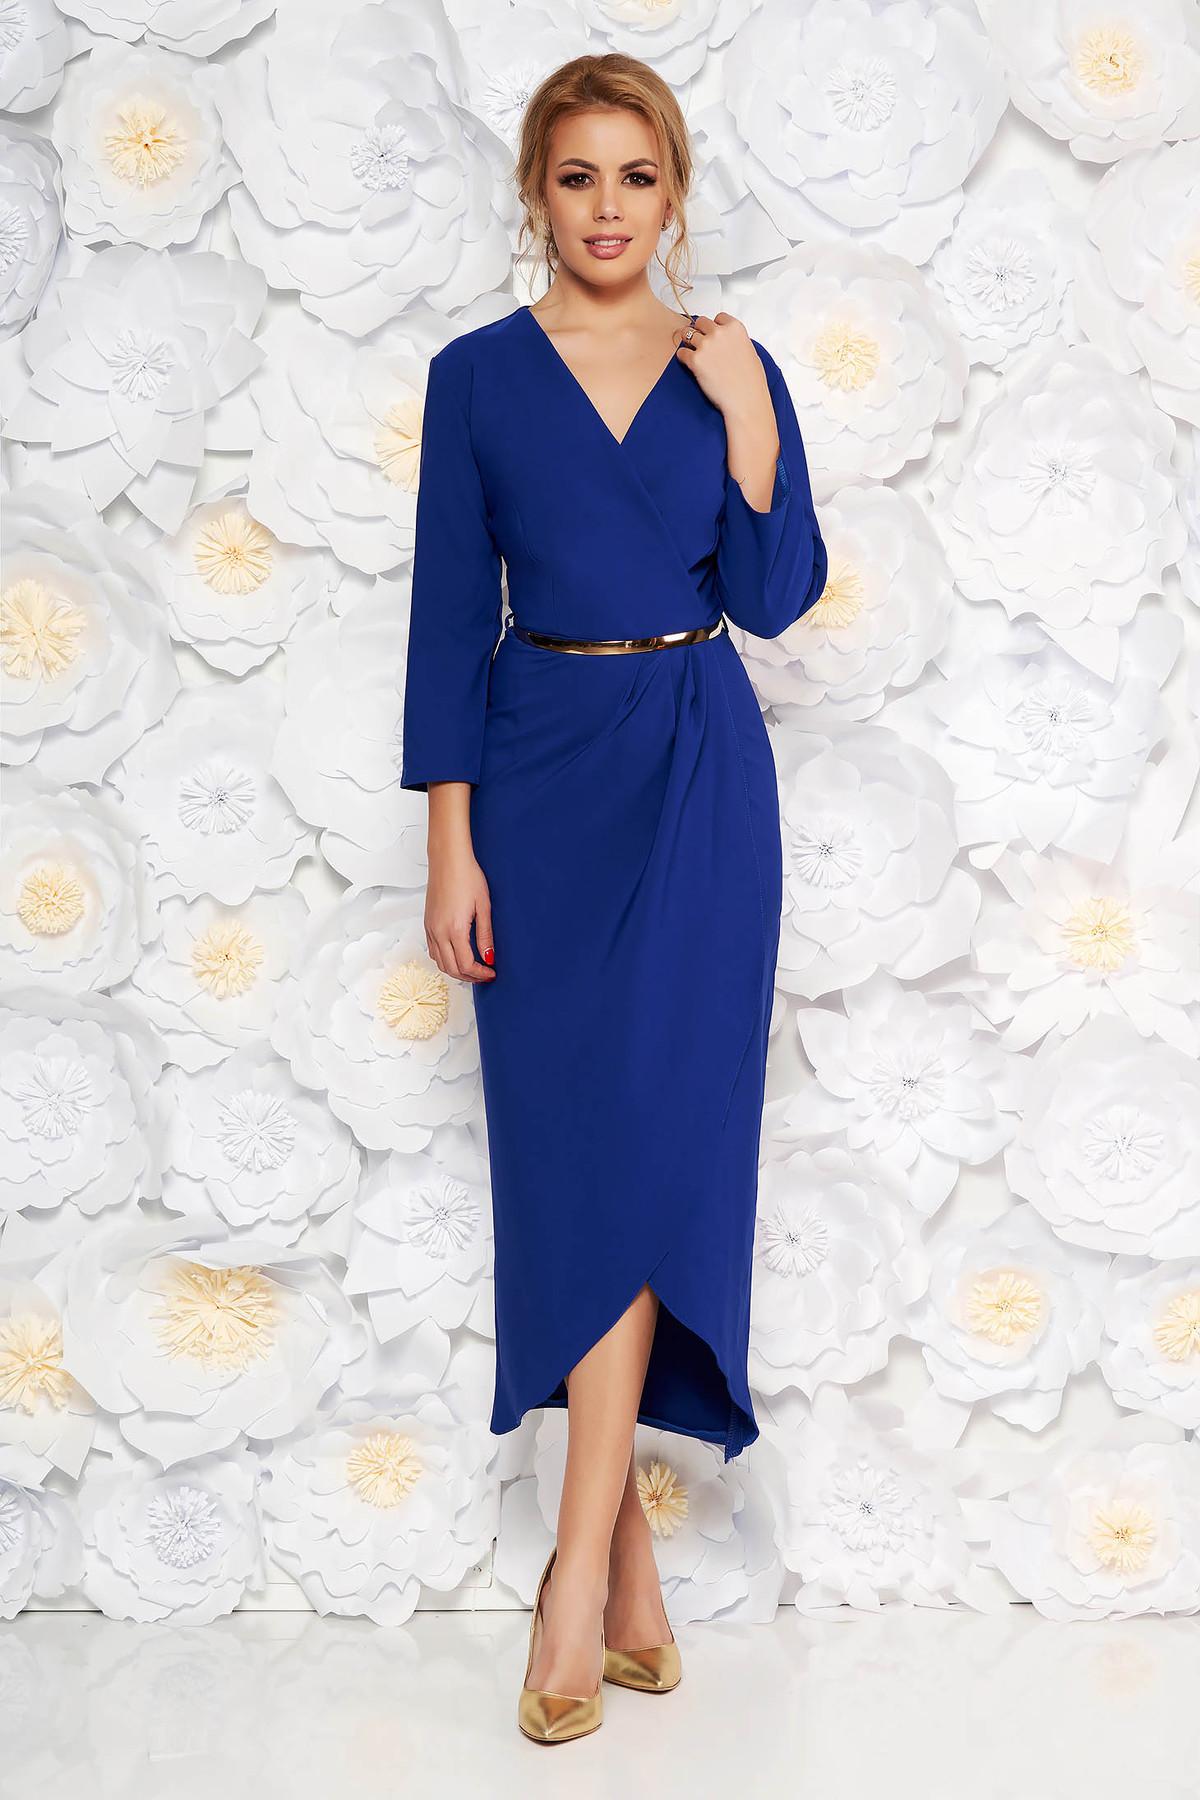 Rochie albastra eleganta din stofa subtire usor elastica captusita pe interior cu accesoriu tip curea